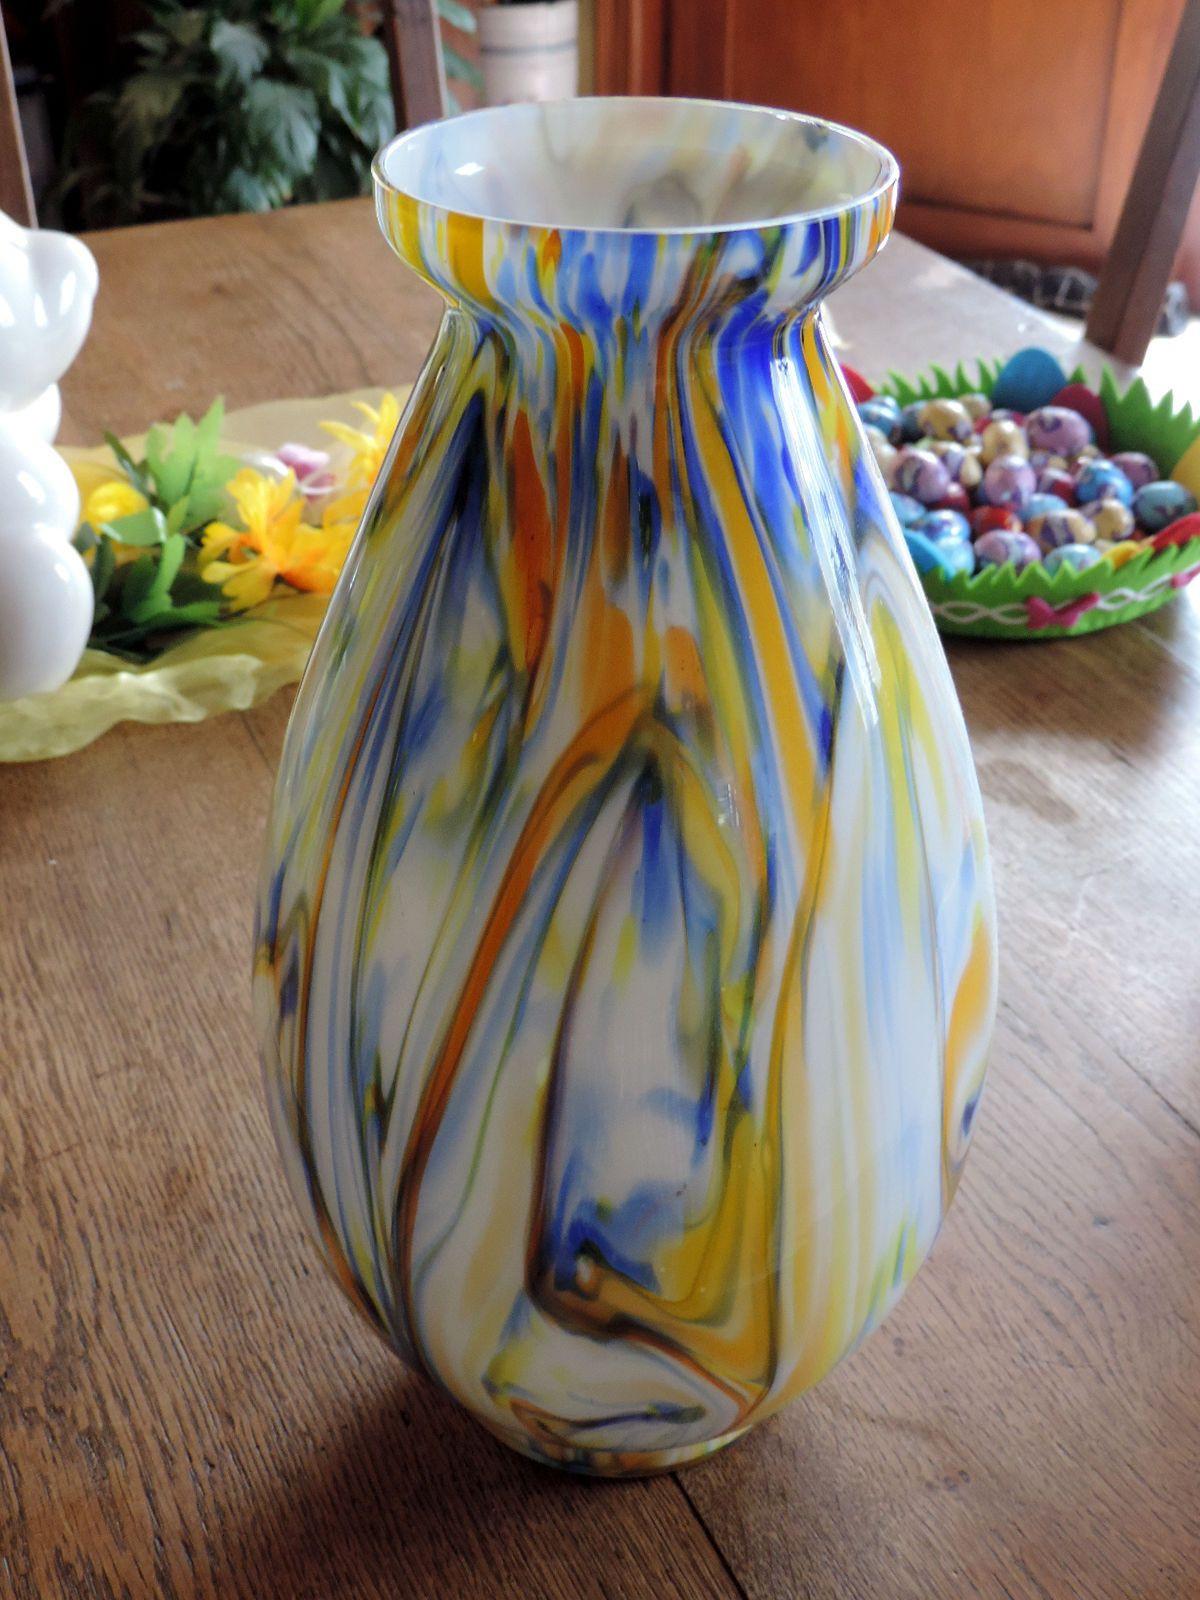 art deco vase of vase art deco en verre moula de scailmont manage heemskerk catteau regarding vase art deco en verre moula de scailmont manage heemskerk catteau ebay